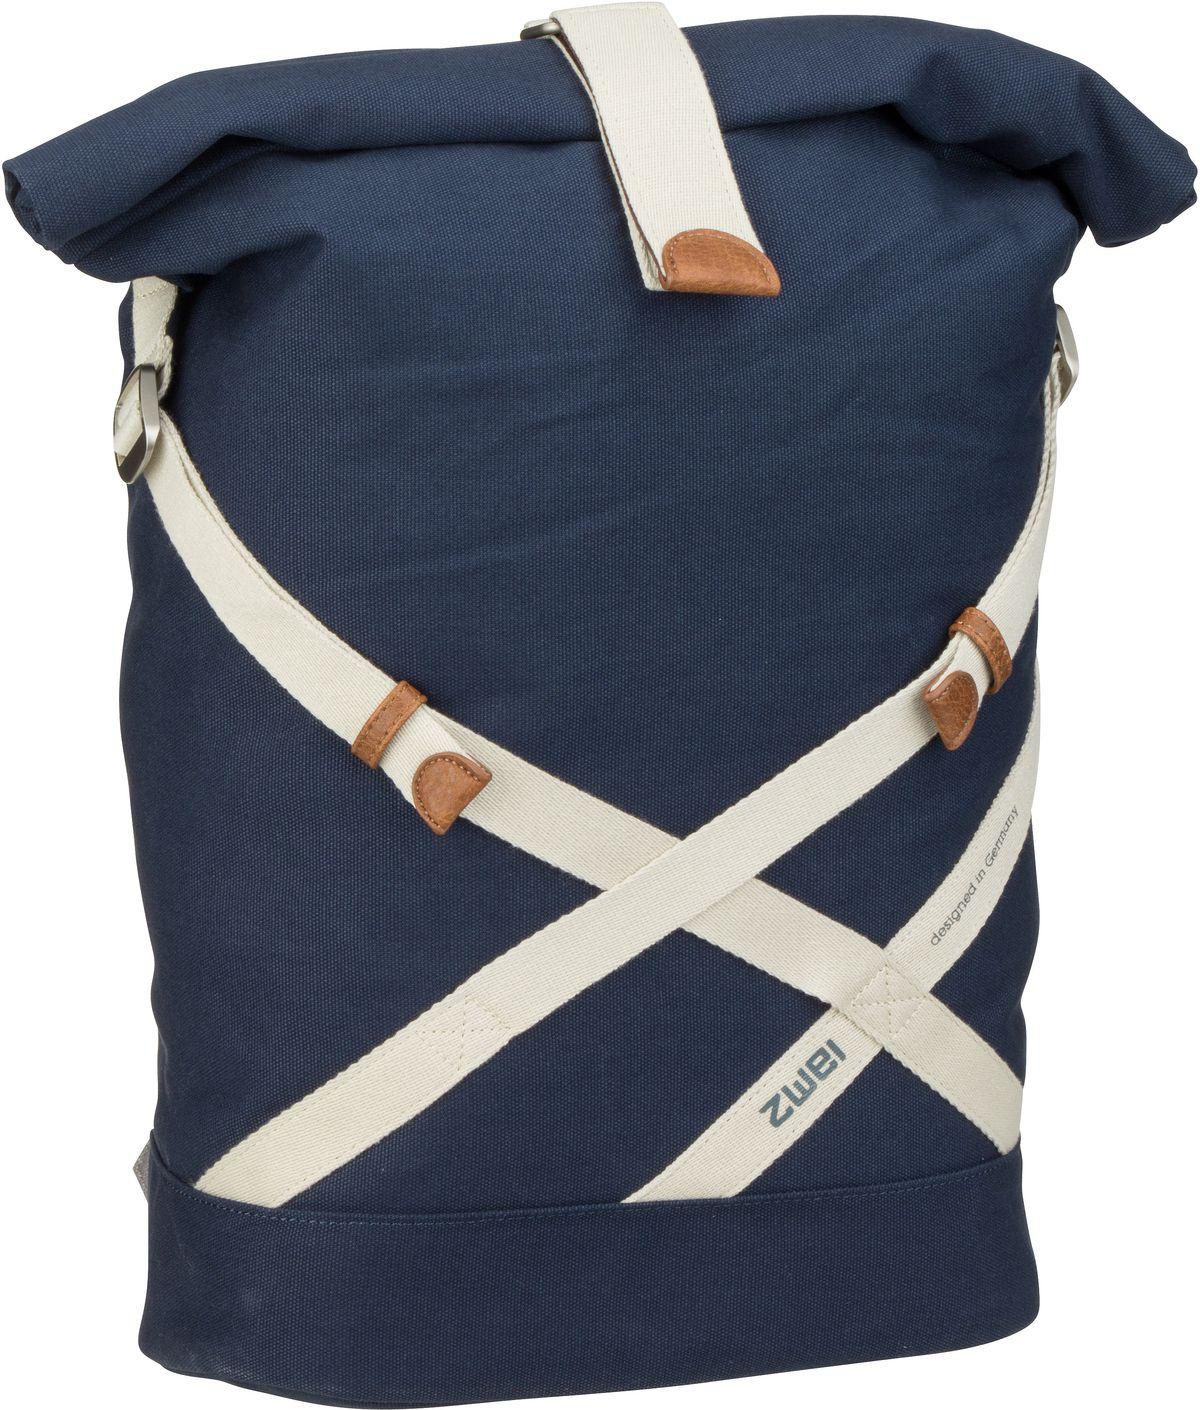 Rucksack / Daypack Yoga YR250 Blue (17 Liter)